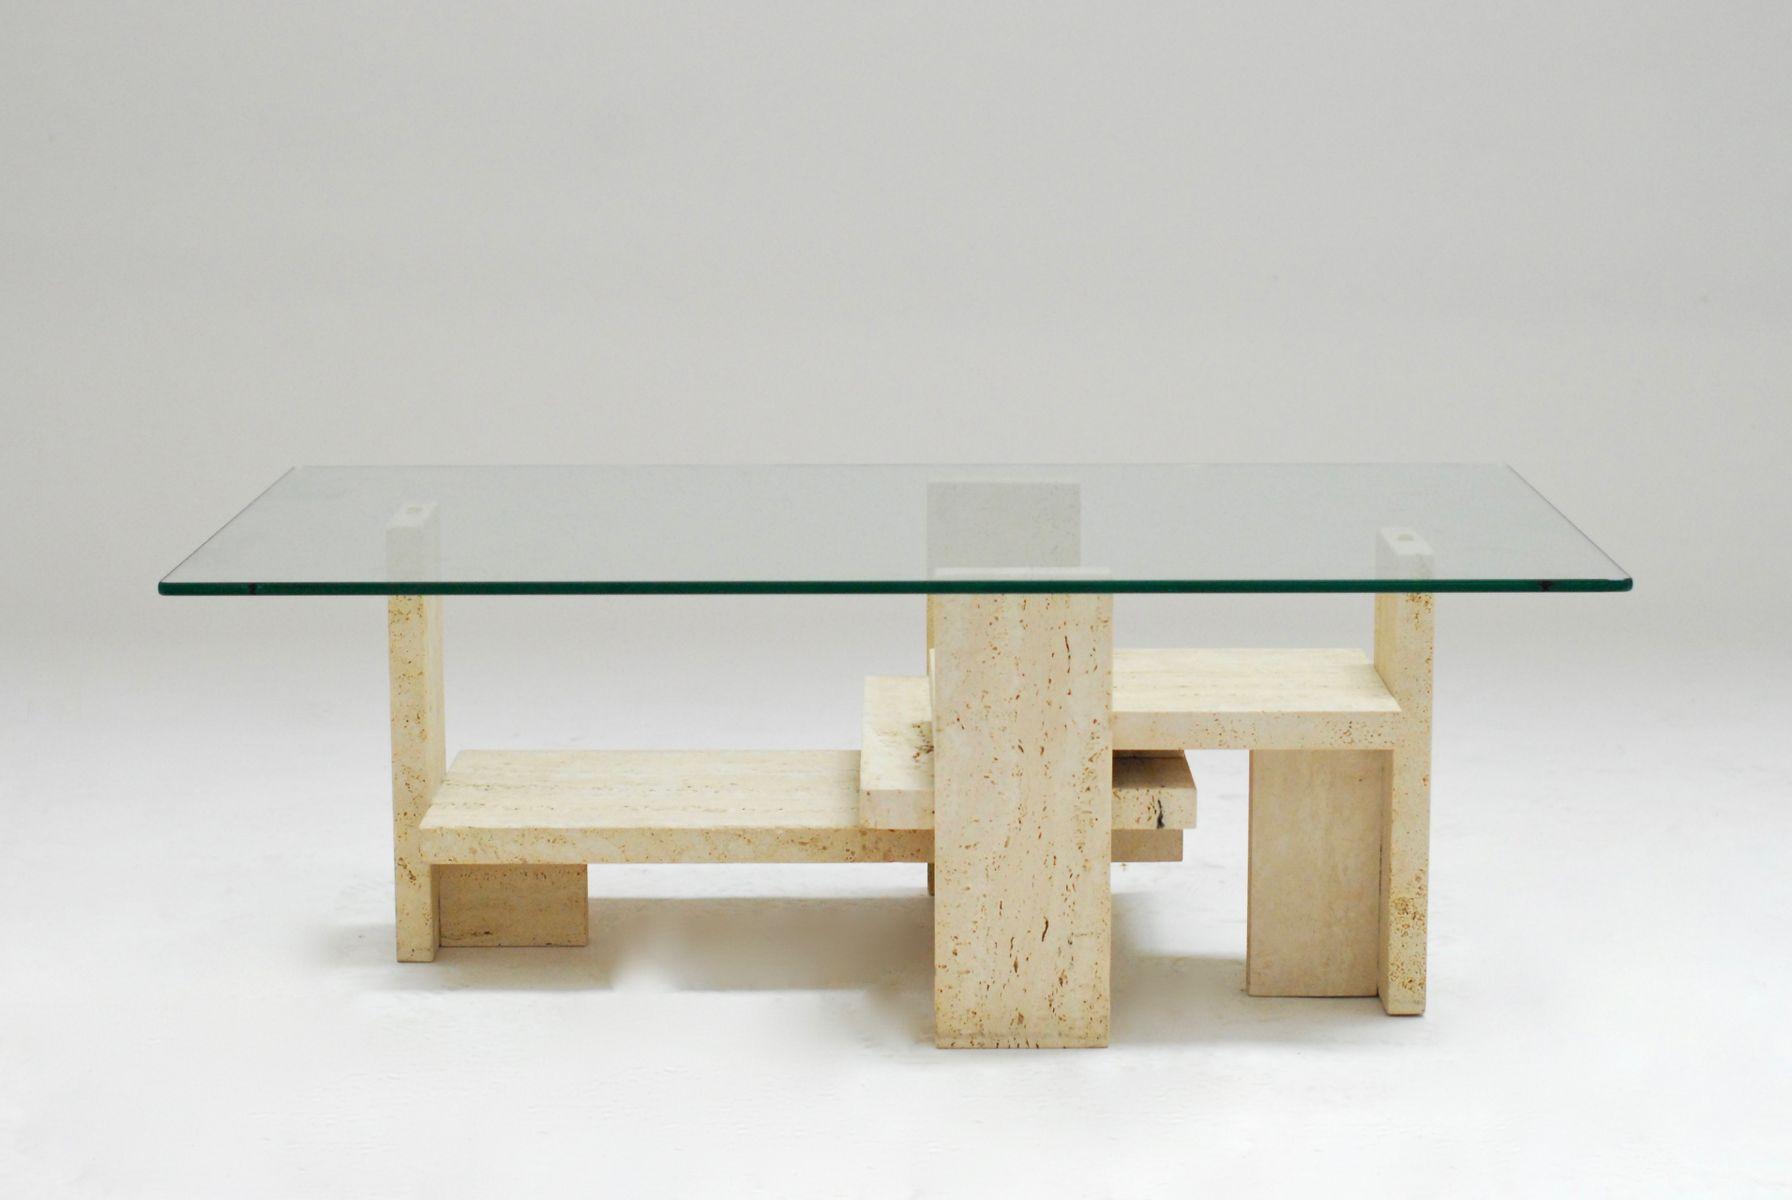 Constructivist Travertine Coffee Table, 1978